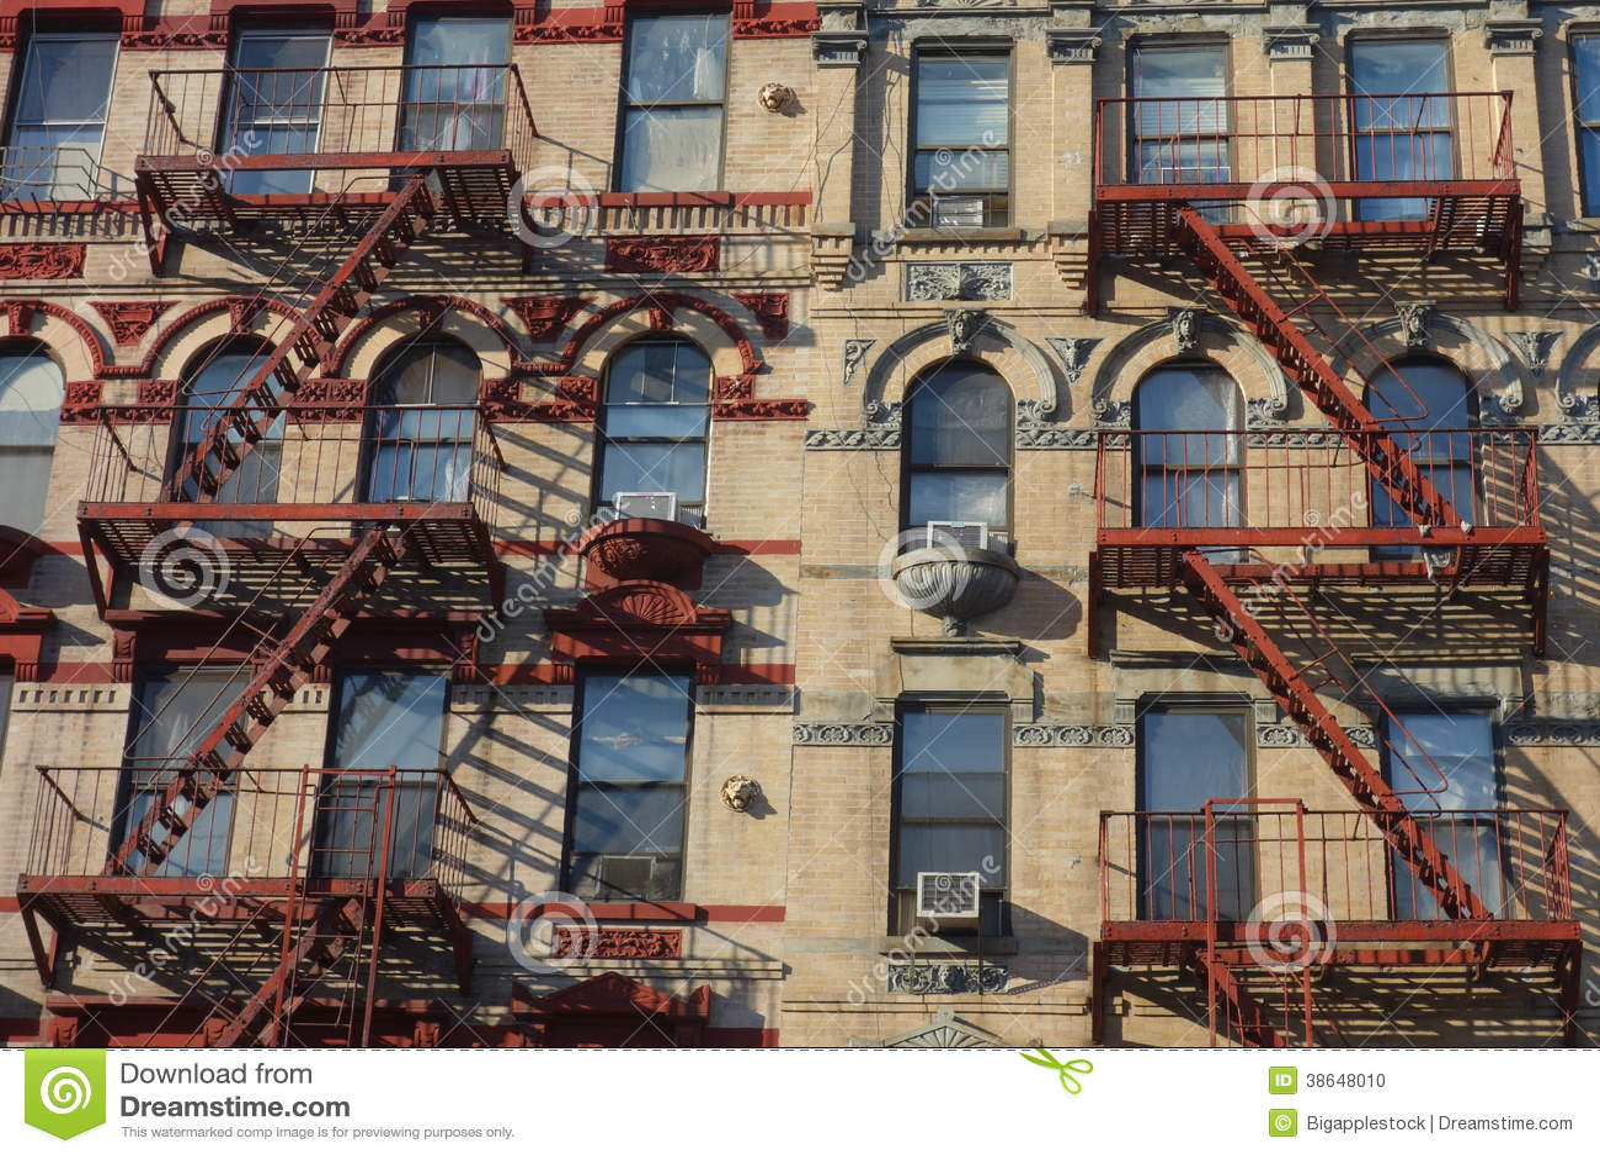 New York City Fire Escapes